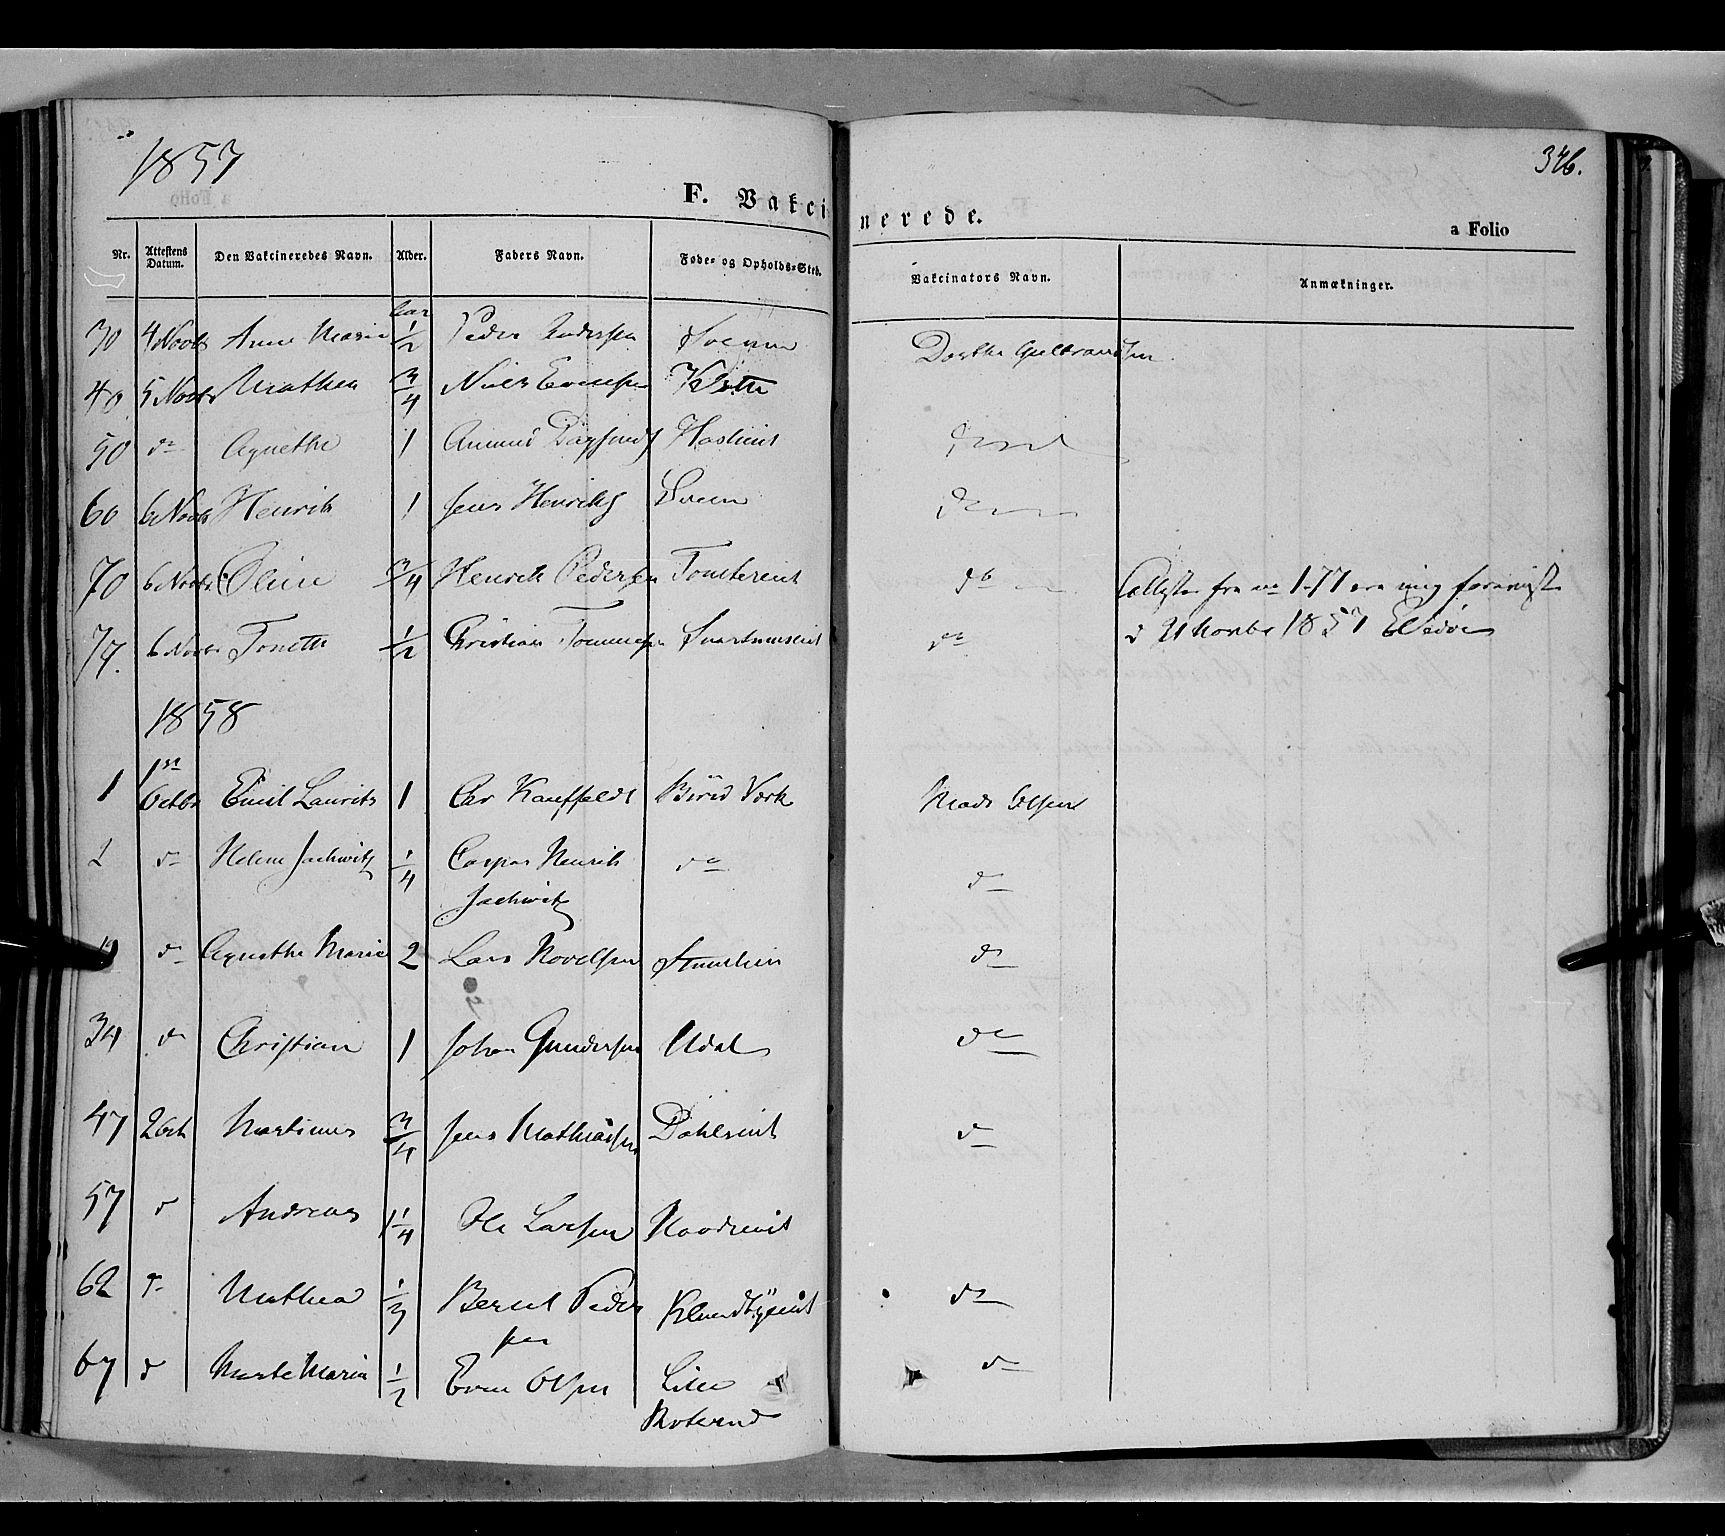 SAH, Biri prestekontor, Ministerialbok nr. 5, 1843-1854, s. 346